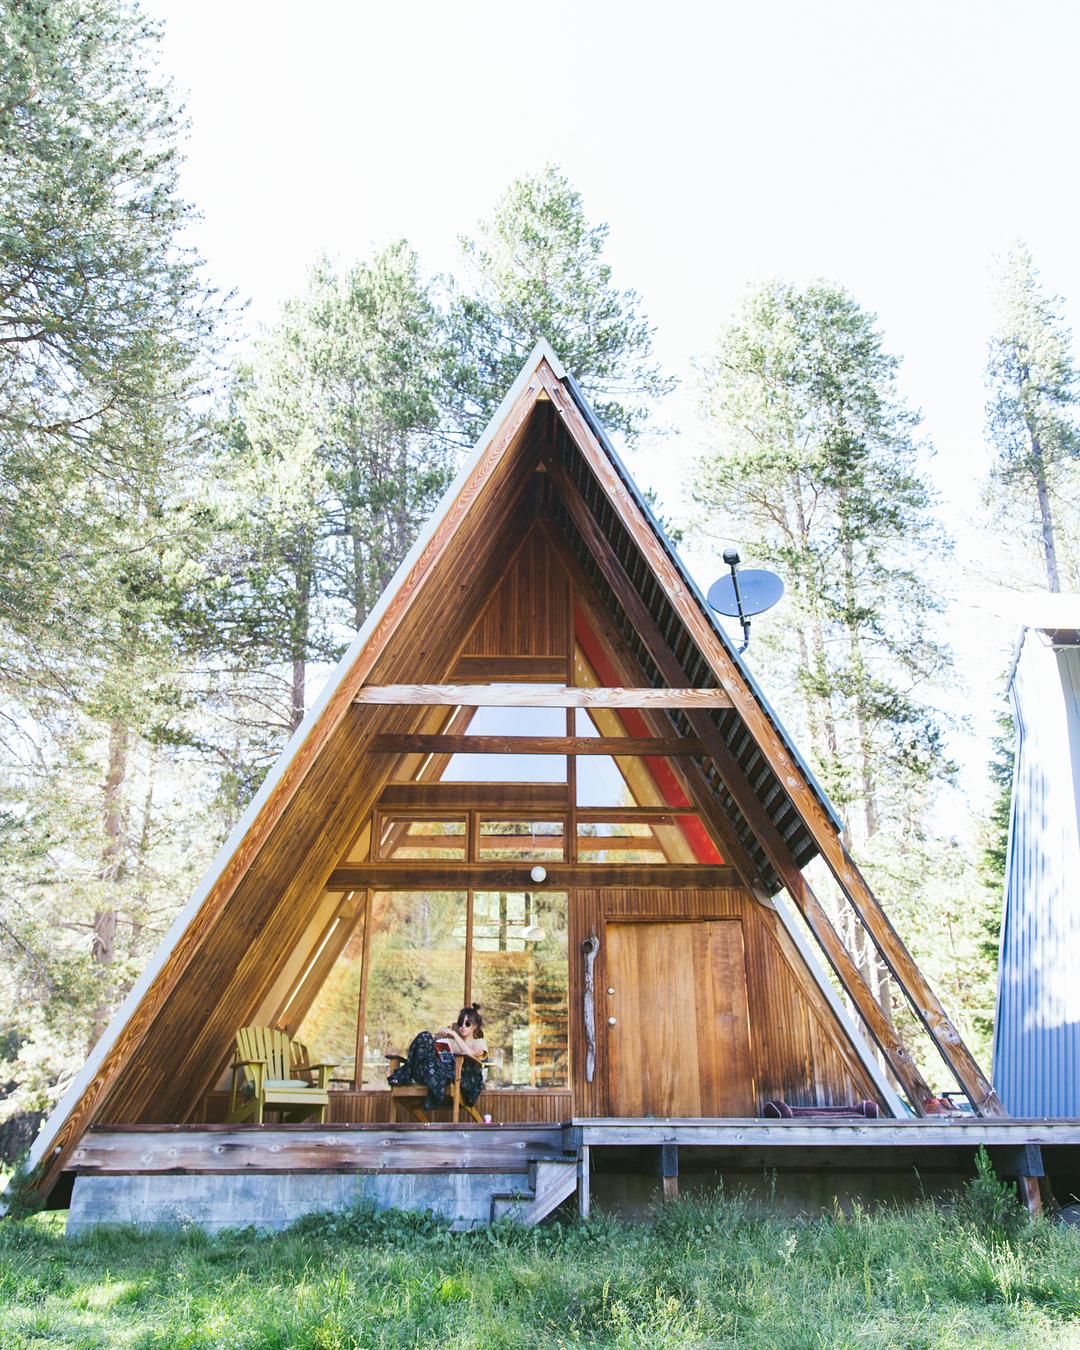 Located near Yosemite